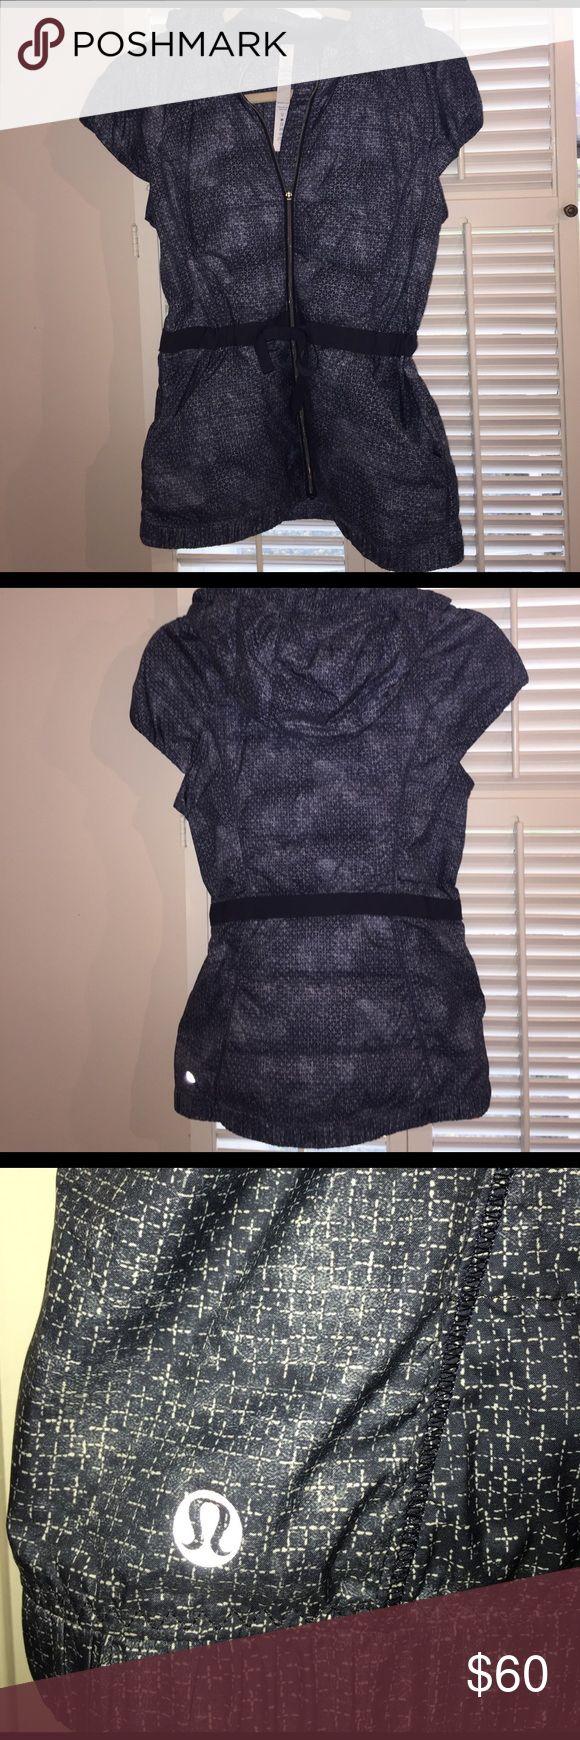 Lululemon vest with cap sleeve Adorable lululemon Athletica vest with capped sleeve and cinch tie waist. Detachable hood. Perfect condition. lululemon athletica Other